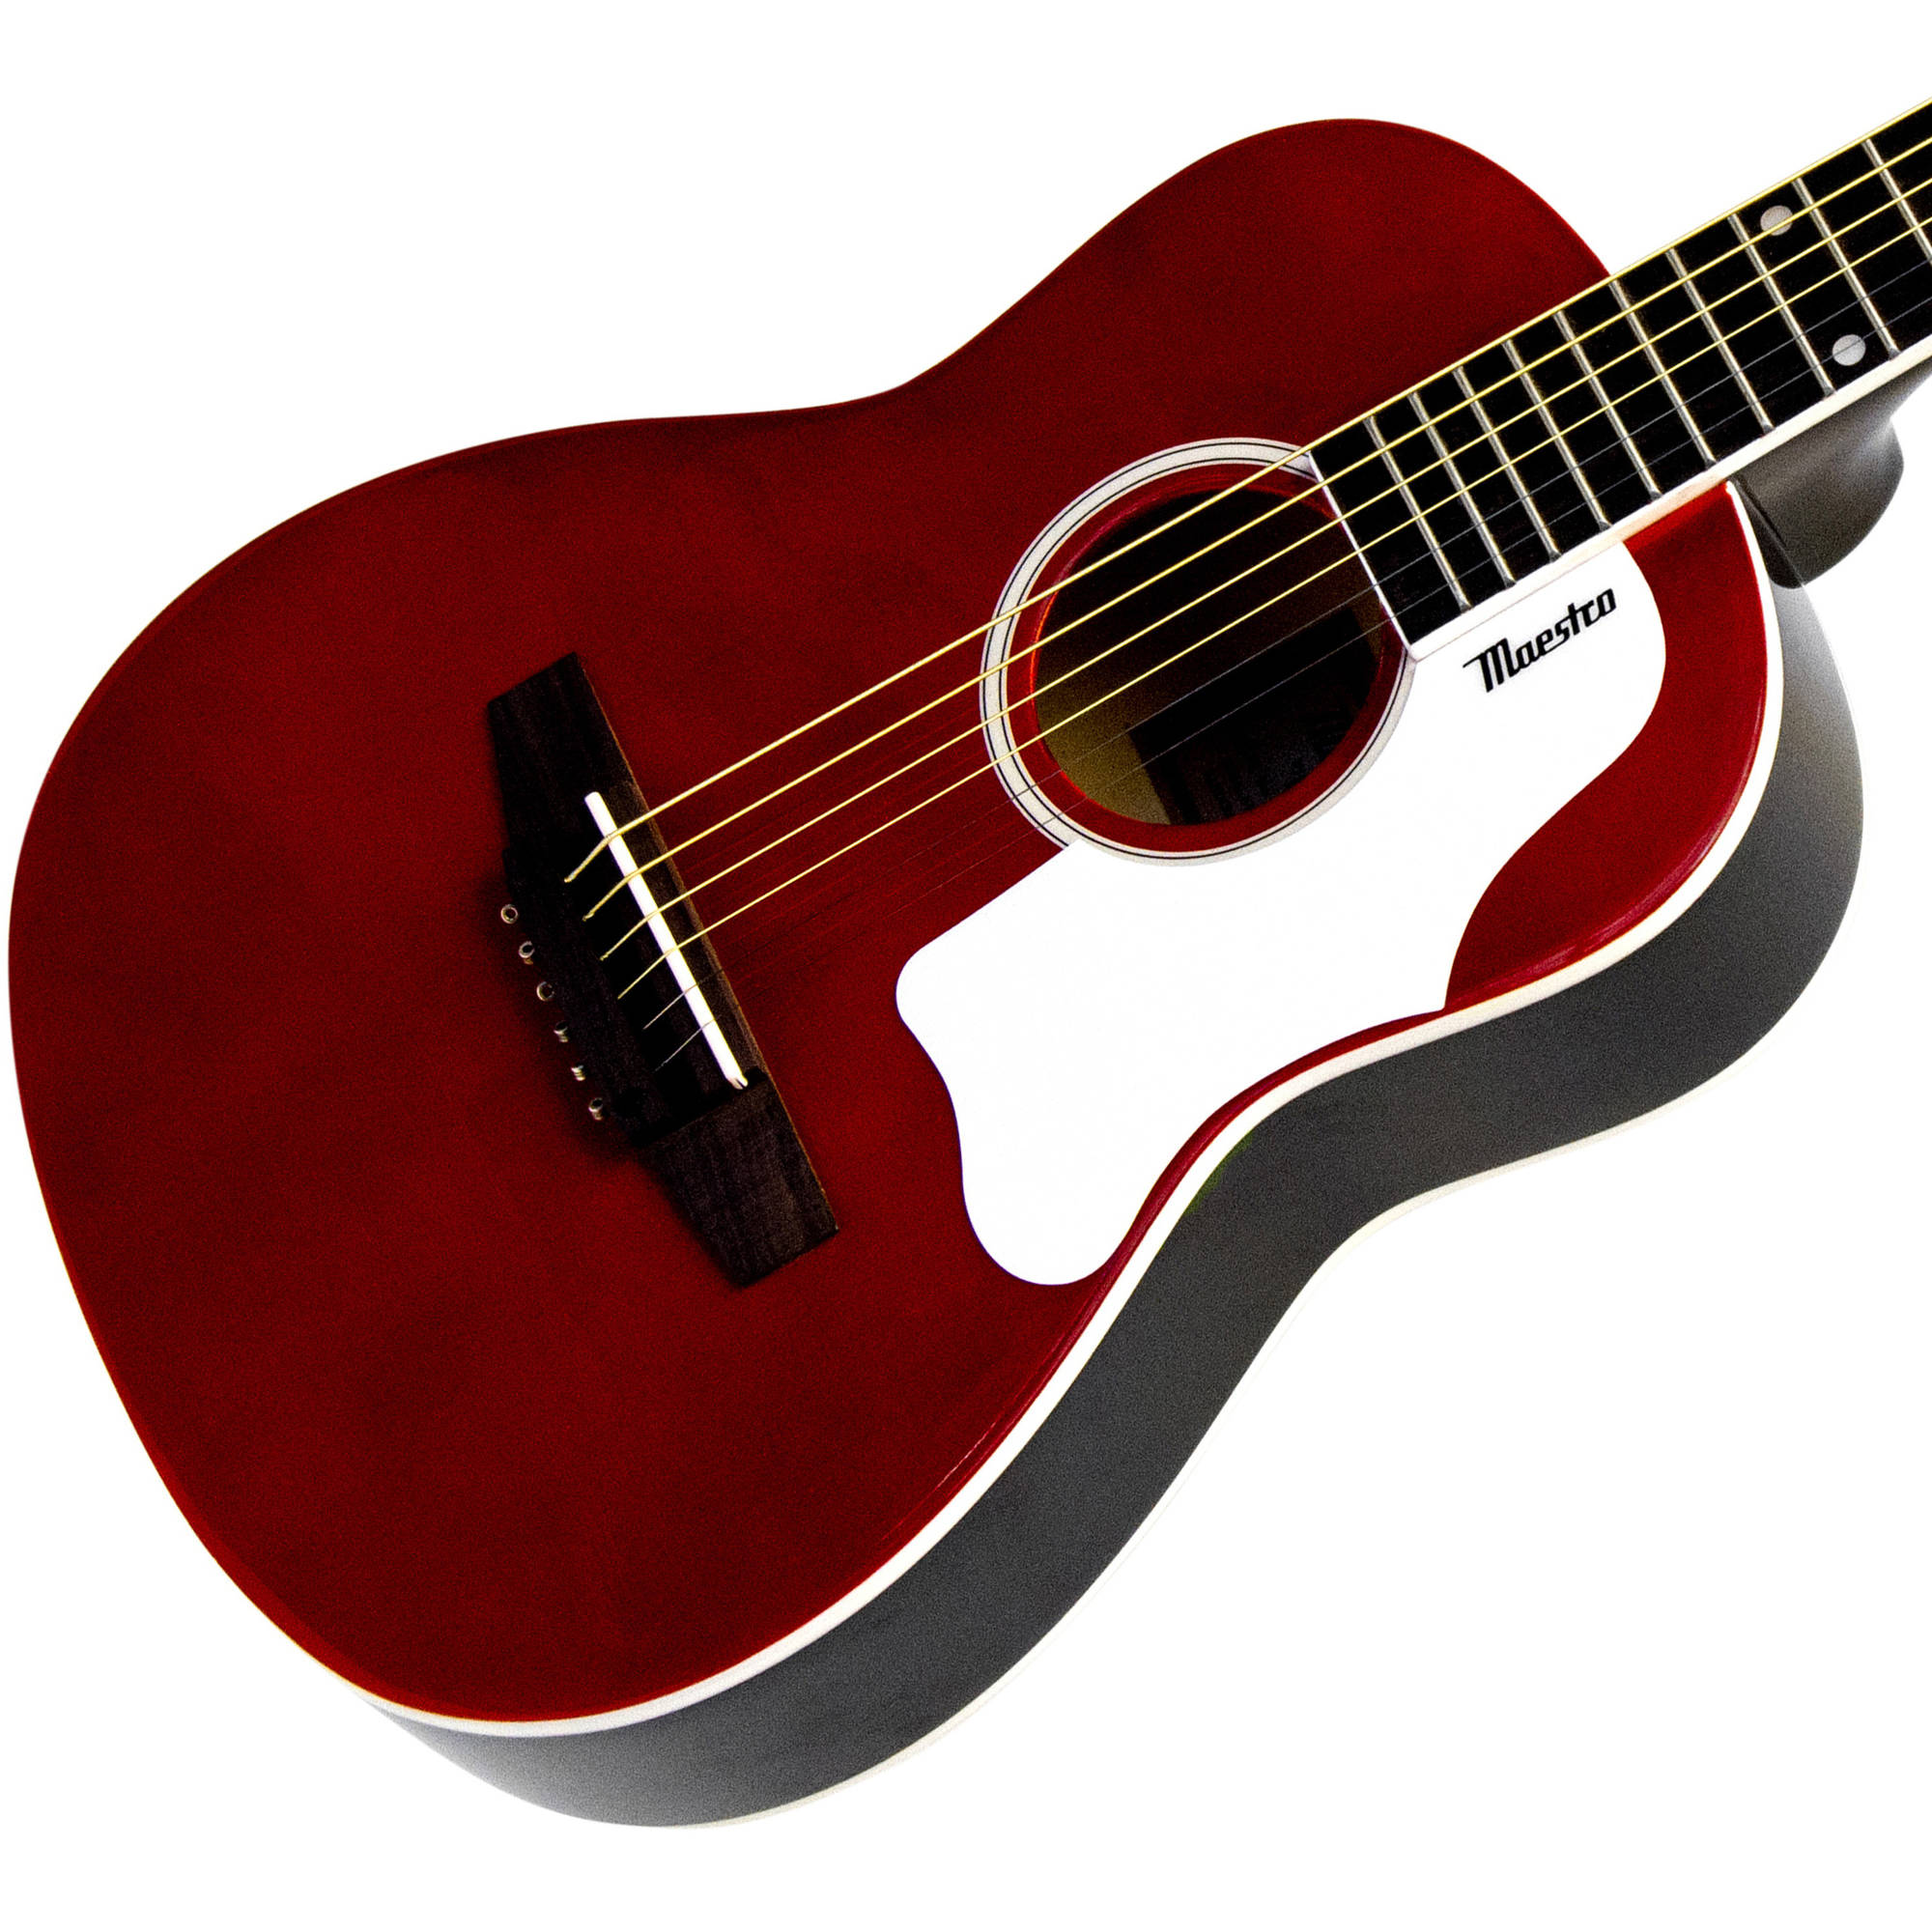 Travel Size Guitar Case